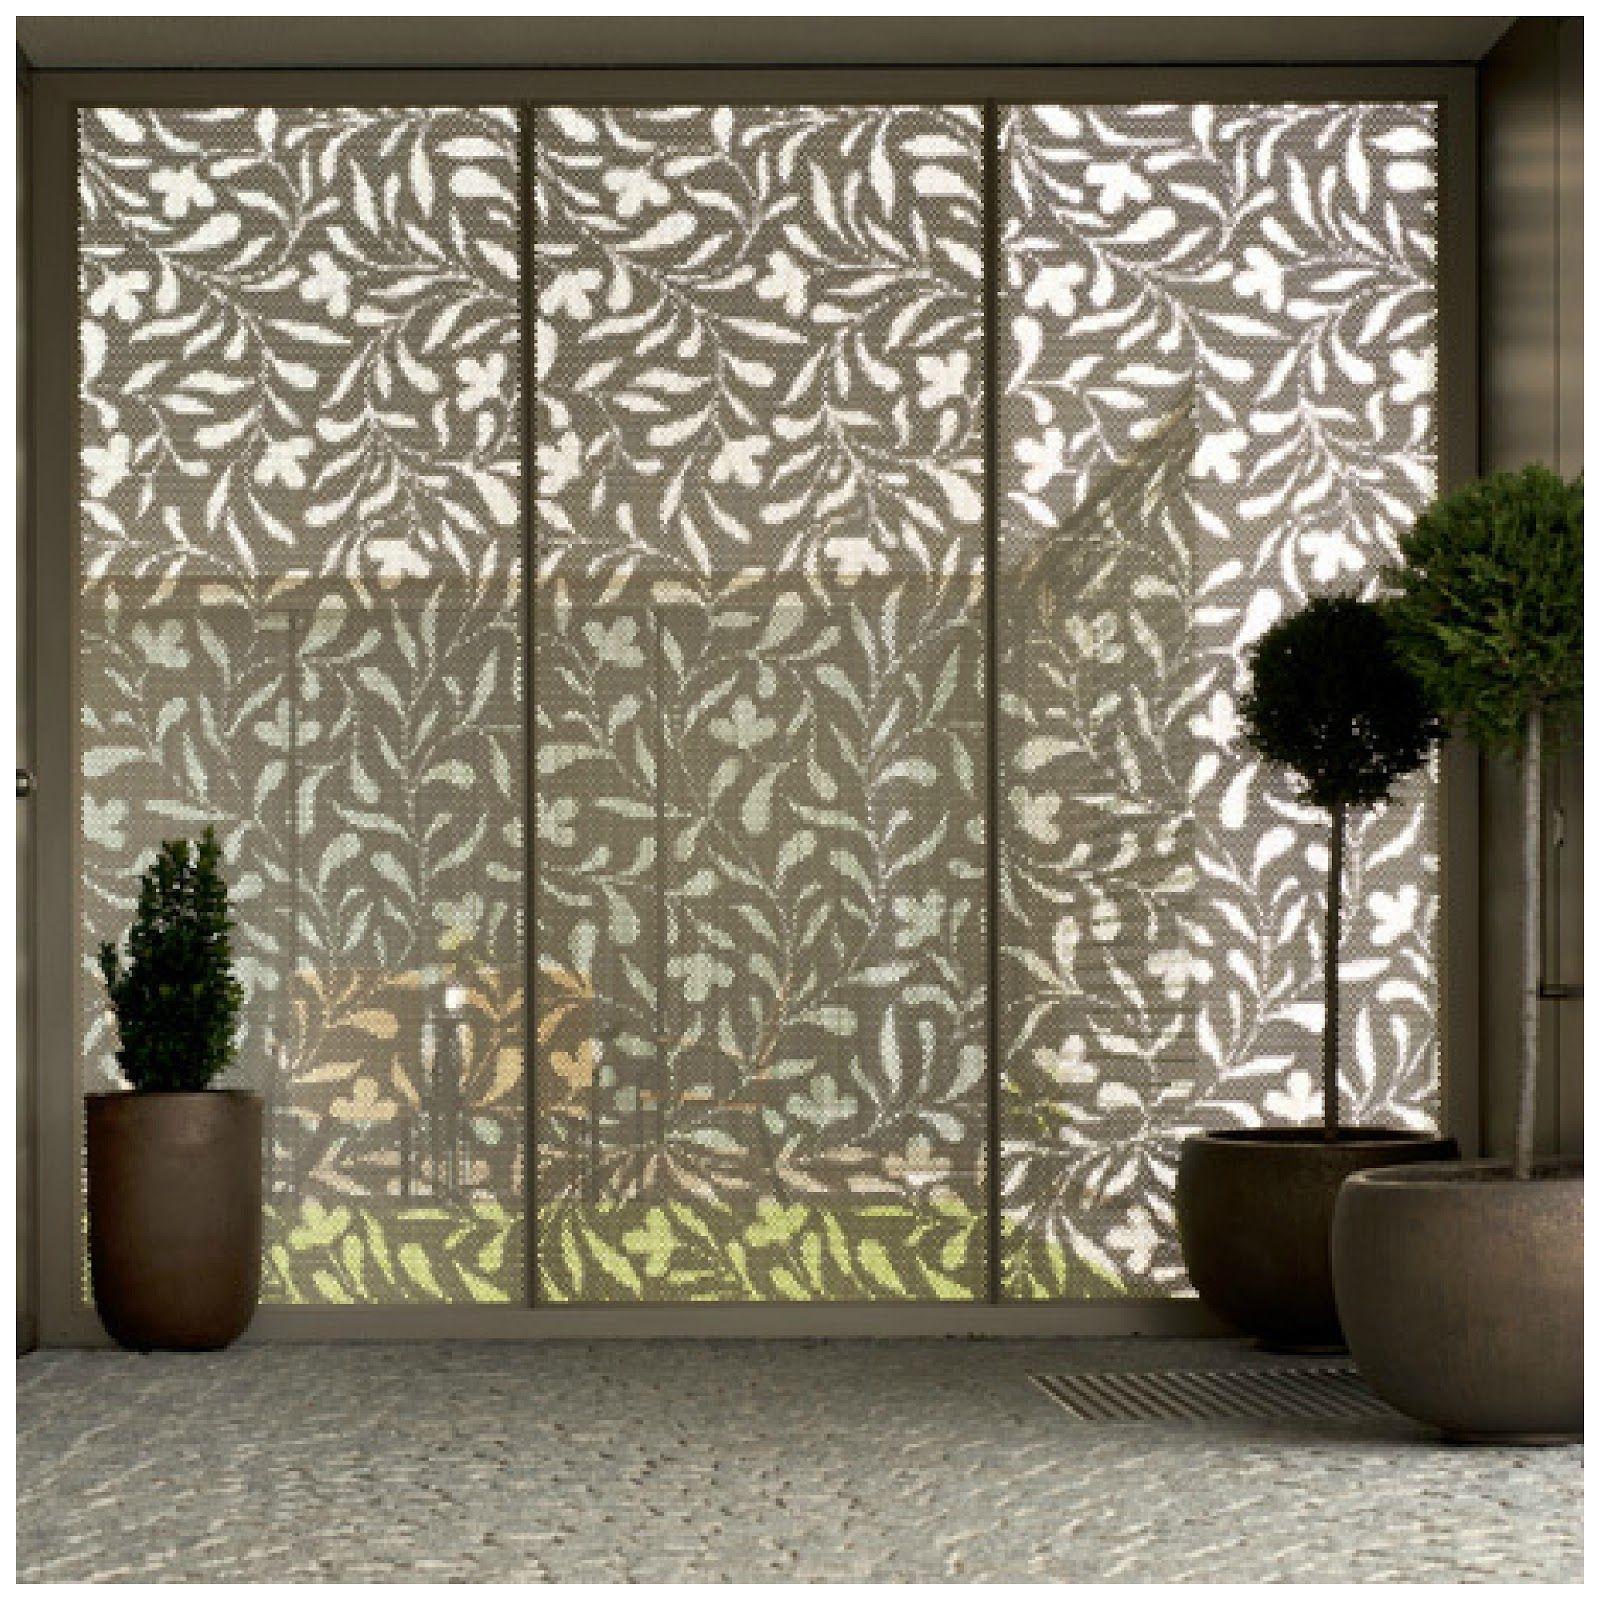 Decorative Screen Panels Interior Design